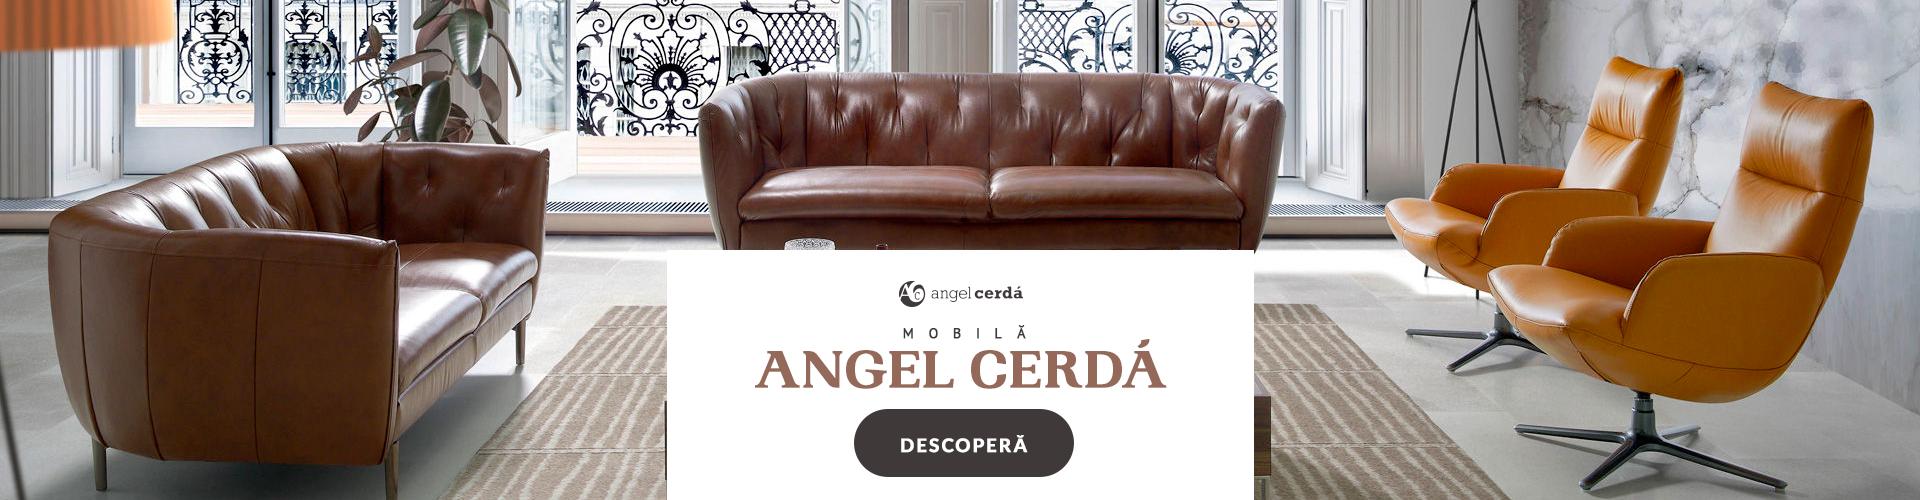 Mobila Angel Cerda